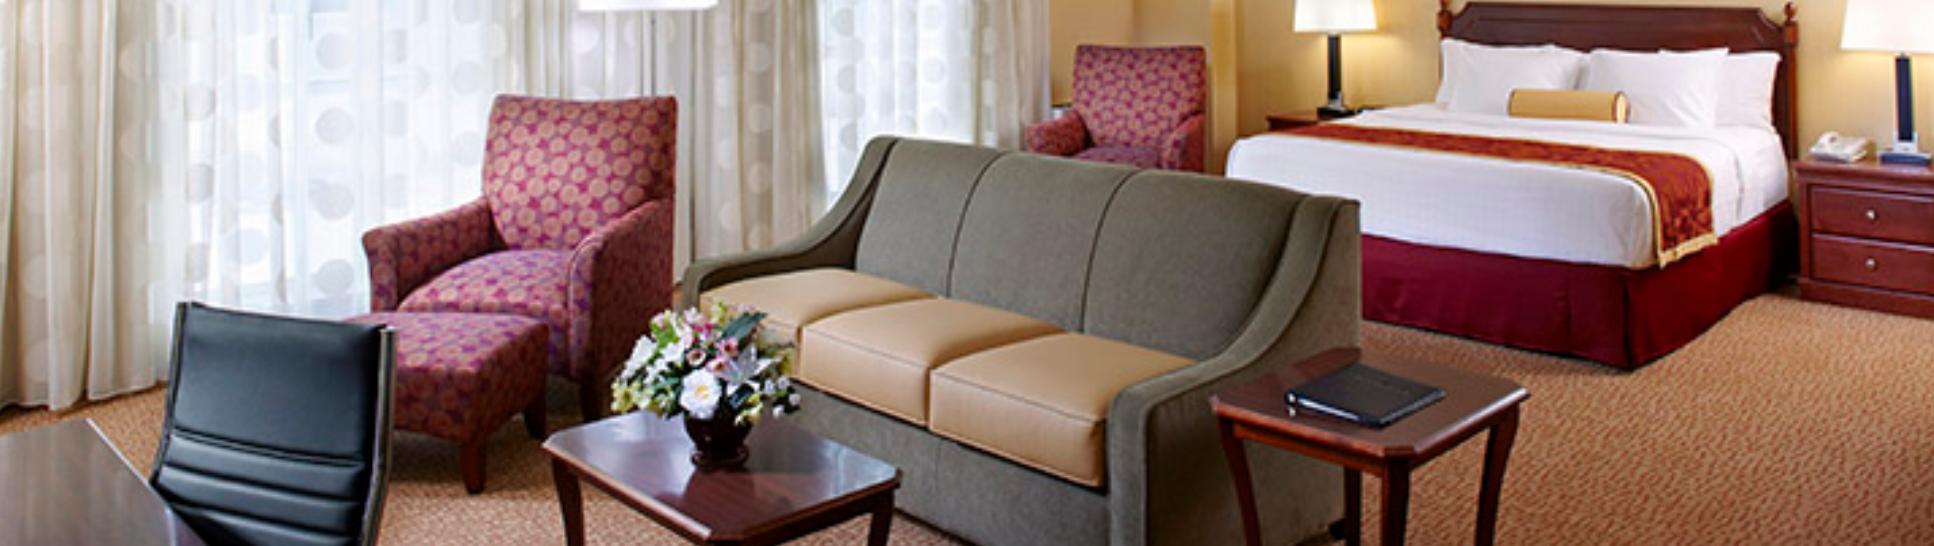 https://www.hotelsbyday.com/_data/default-hotel_image/3/17897/screenshot-2020-06-10-at-3-23-45-pm.png